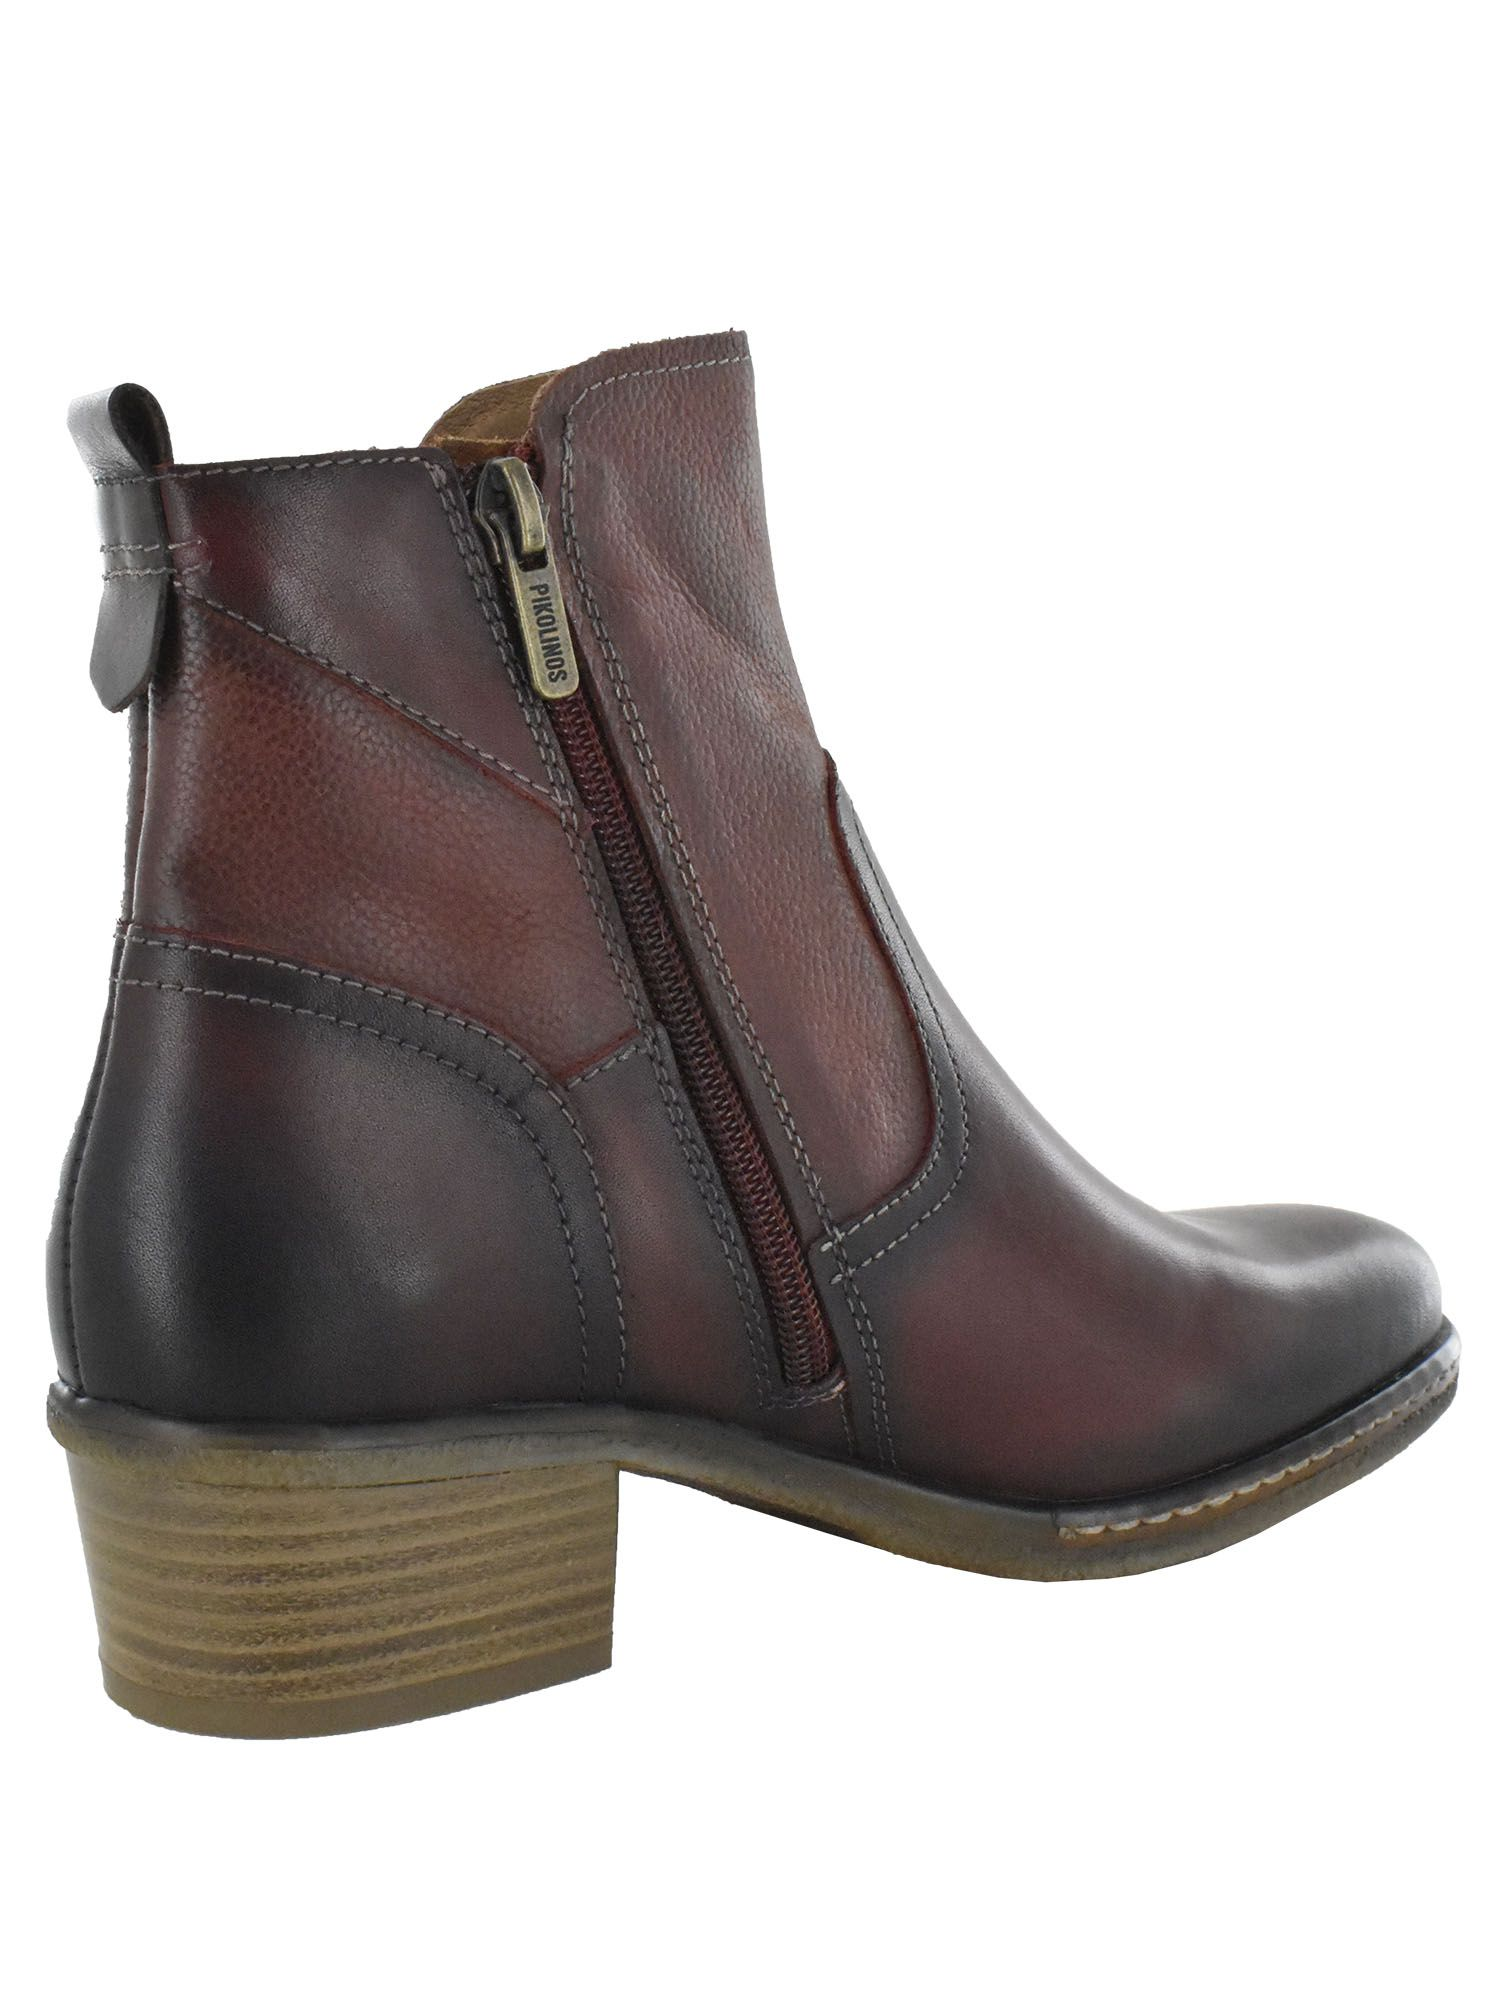 Pikolinos Womens Zaragoza W9H-8704 Ankle Boots, Arcilla, 35 M EU / 4.5-5 M US